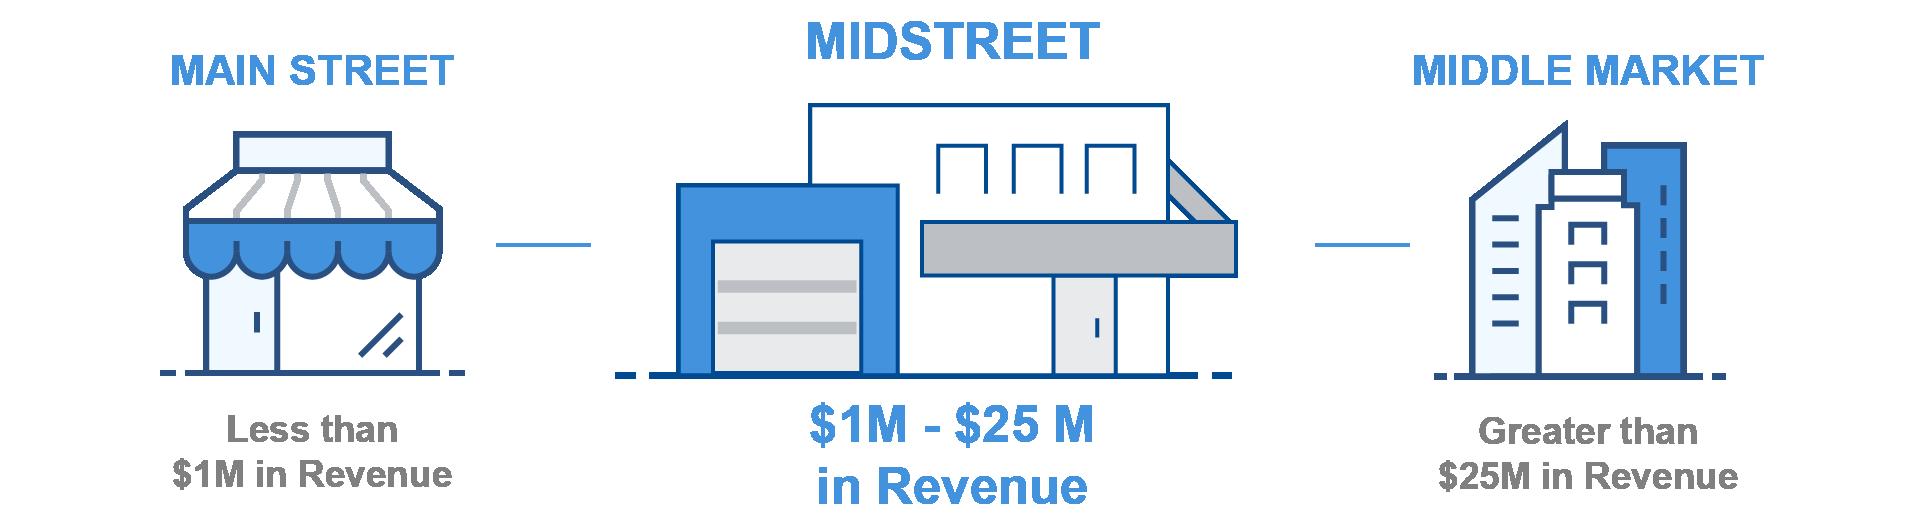 MidStreet Business Diagram-2